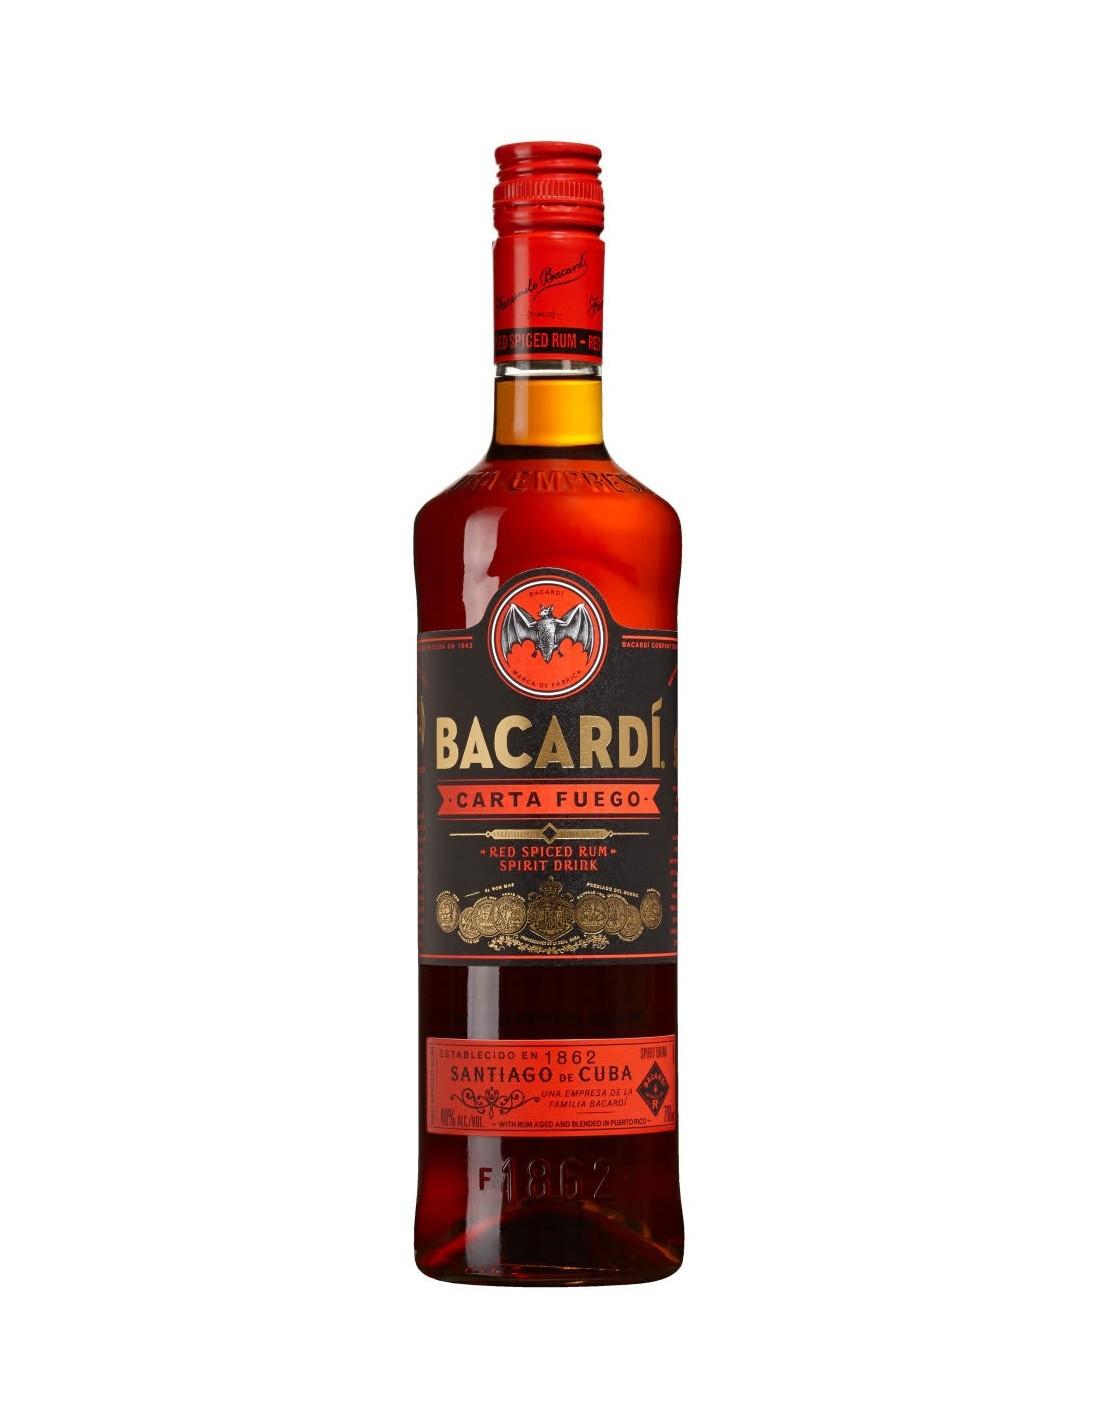 Rom negru Bacardi Carta Fuego, 40% alc., 1L